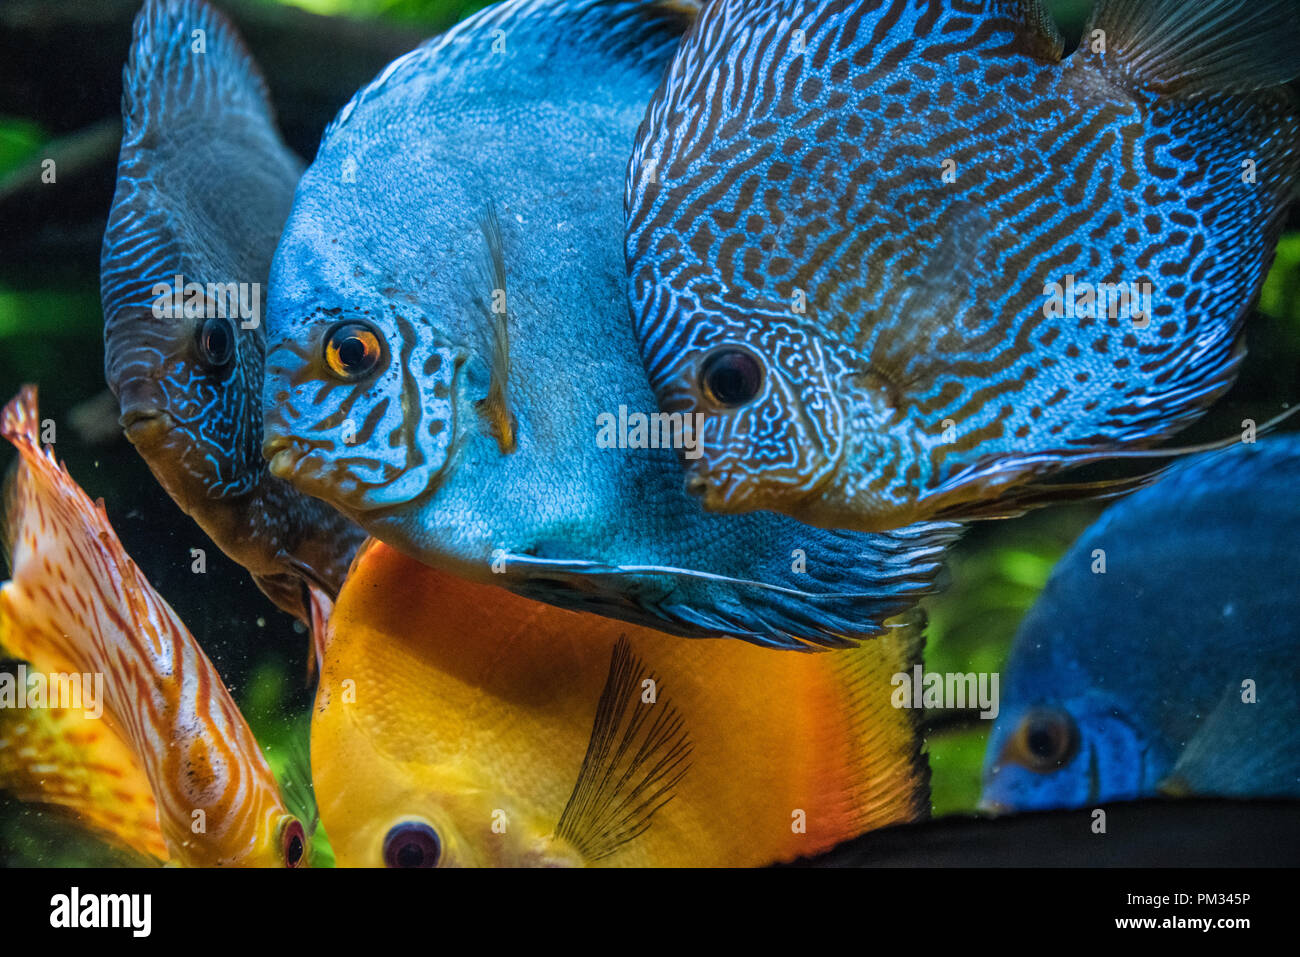 Colorful Discus Symphysodon Aequifasciatus Fish A Tropical